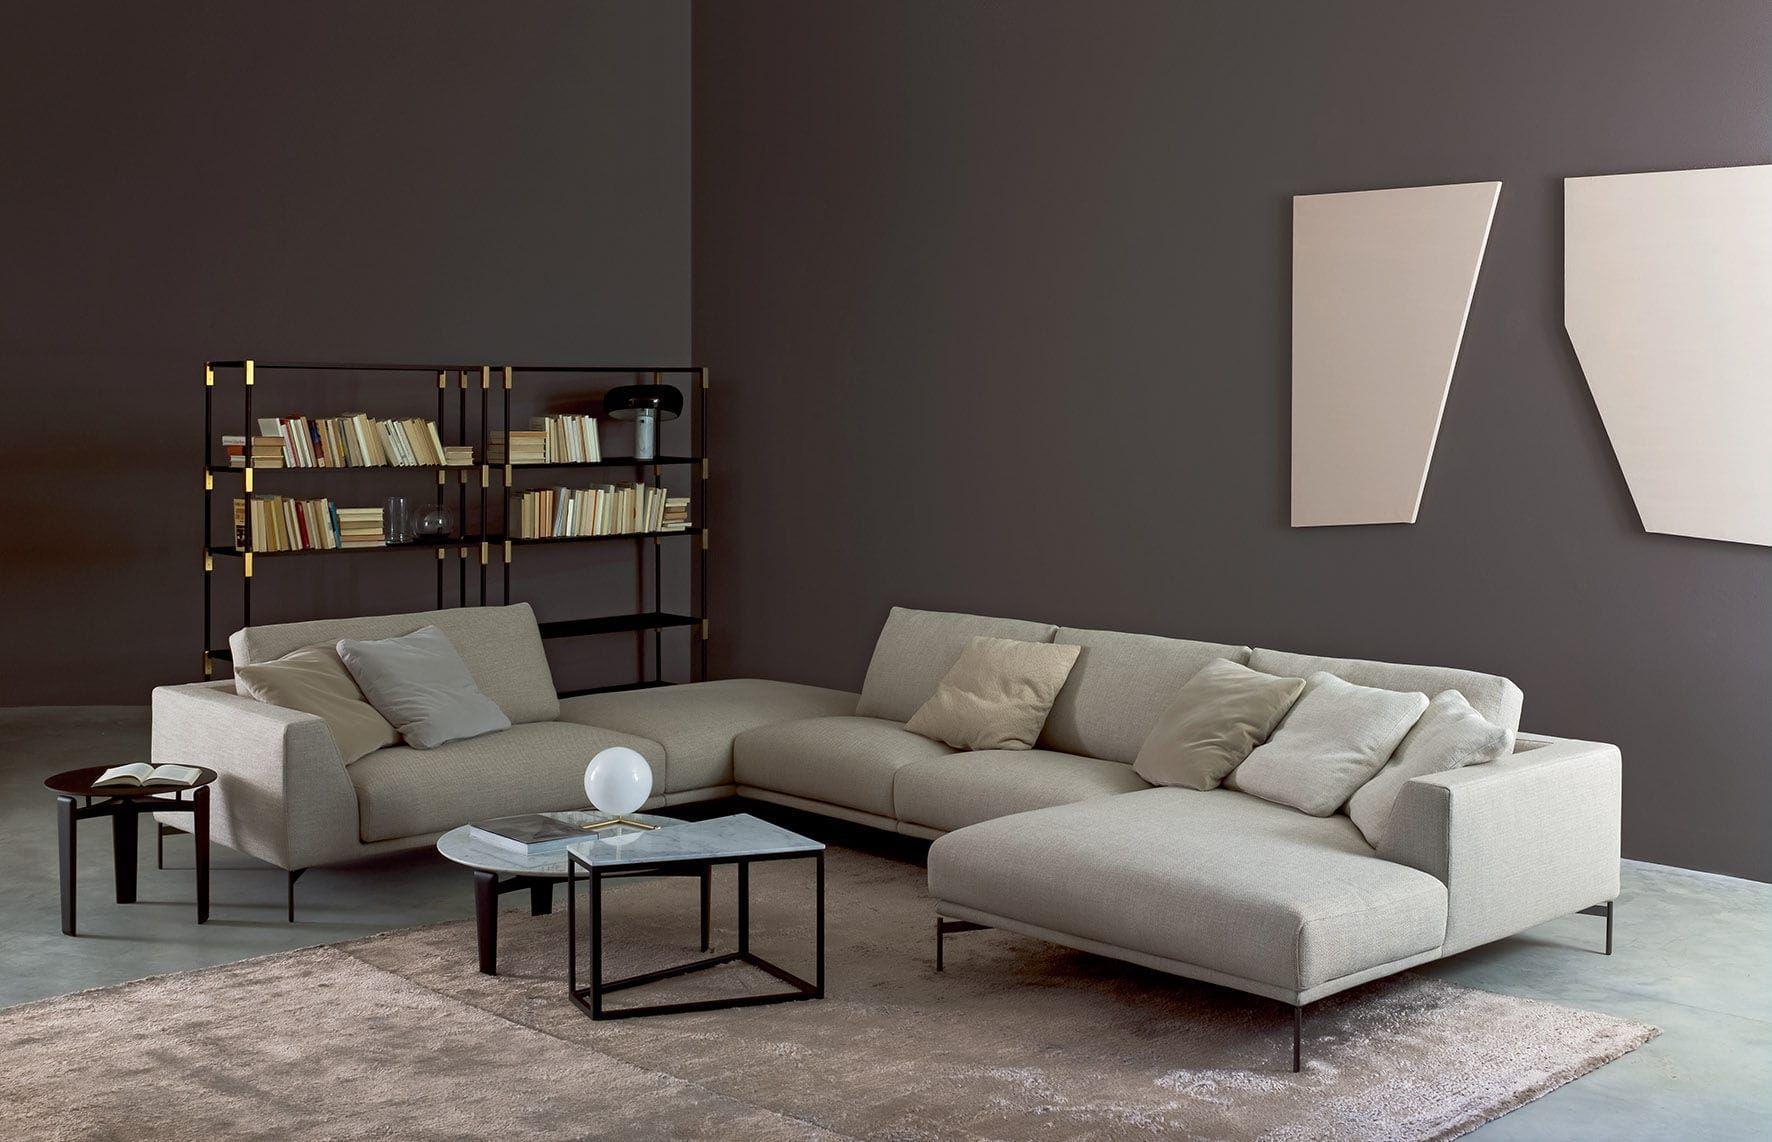 Eck Sofa Modul modern für Innenbereich HOLLYWOOD by Claesson